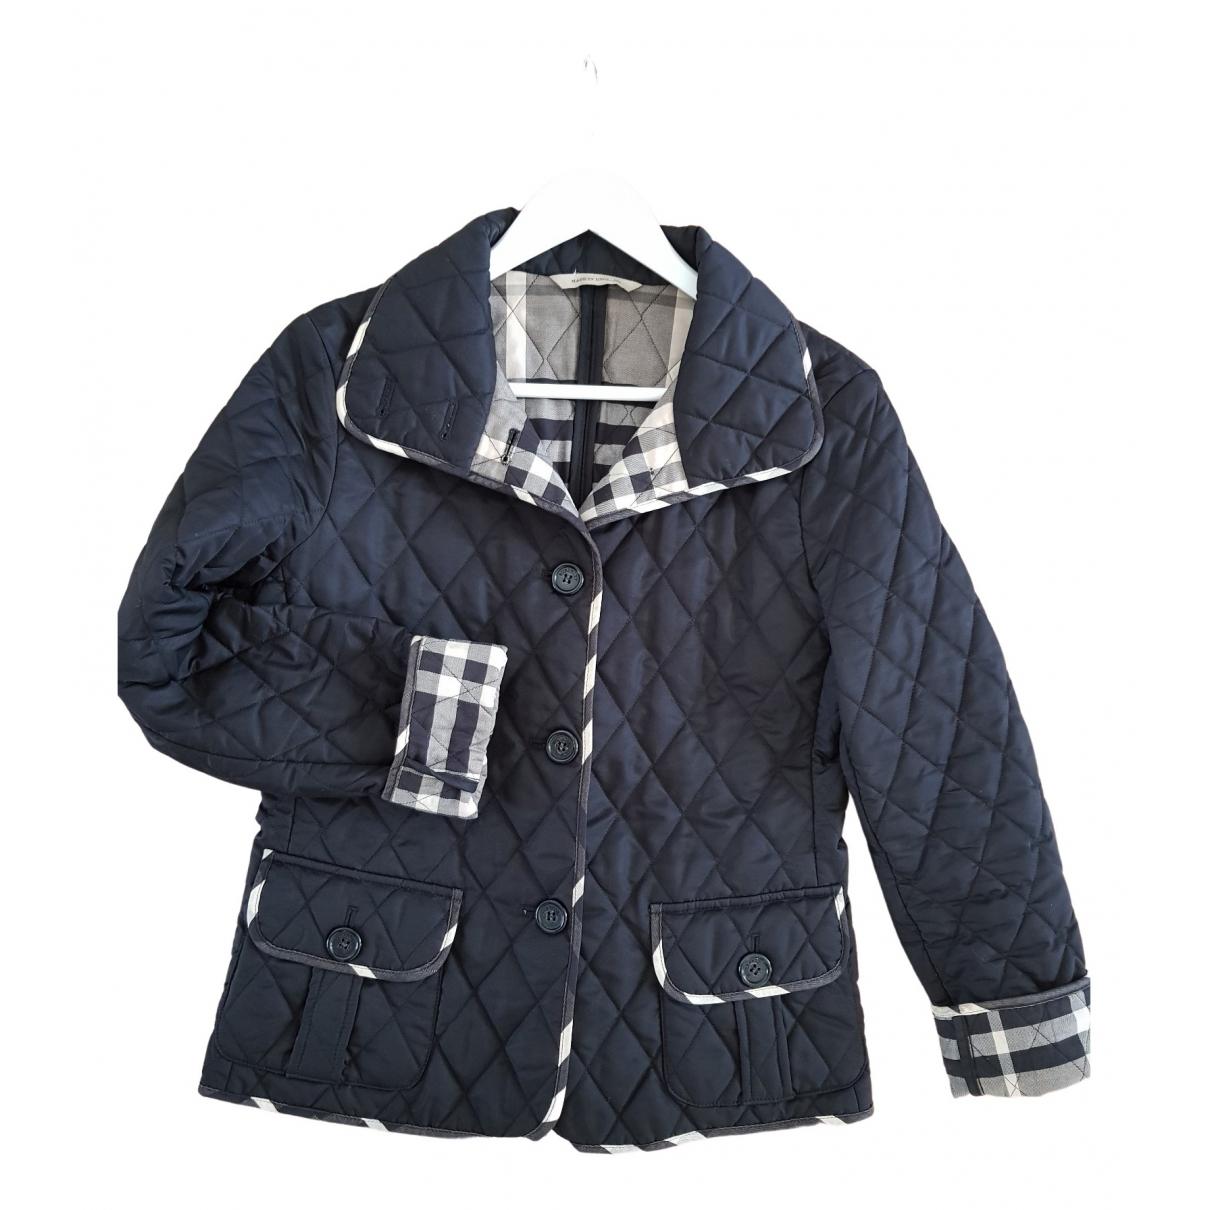 Burberry \N Black jacket for Women M International